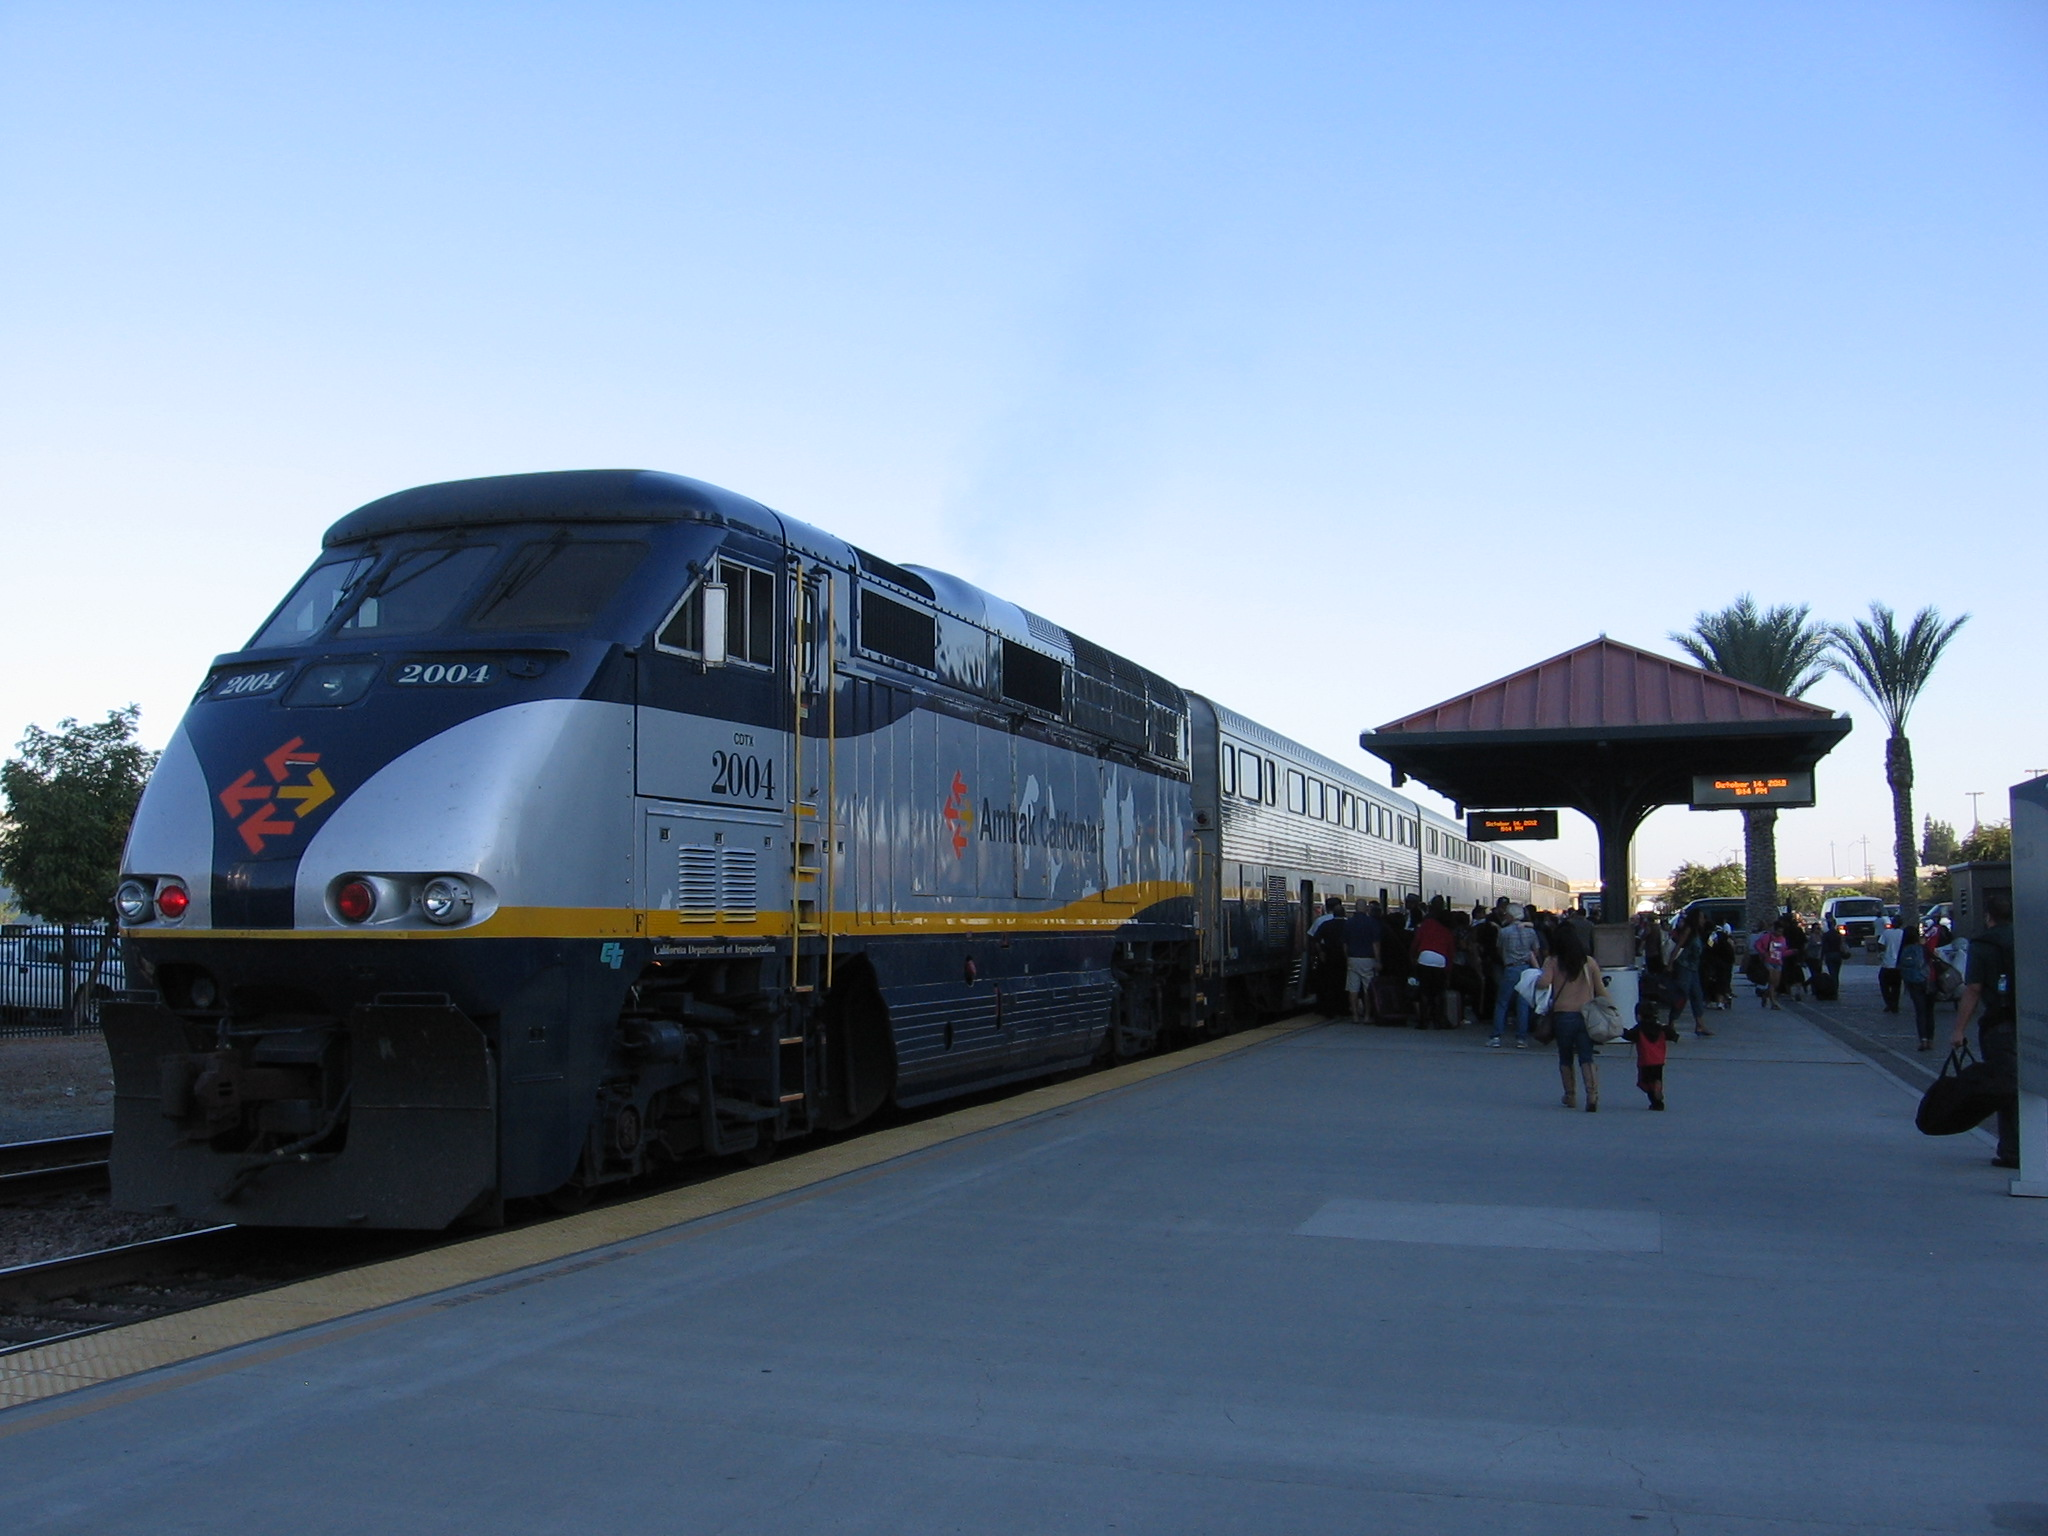 File:Fresno station 2417 19.JPG